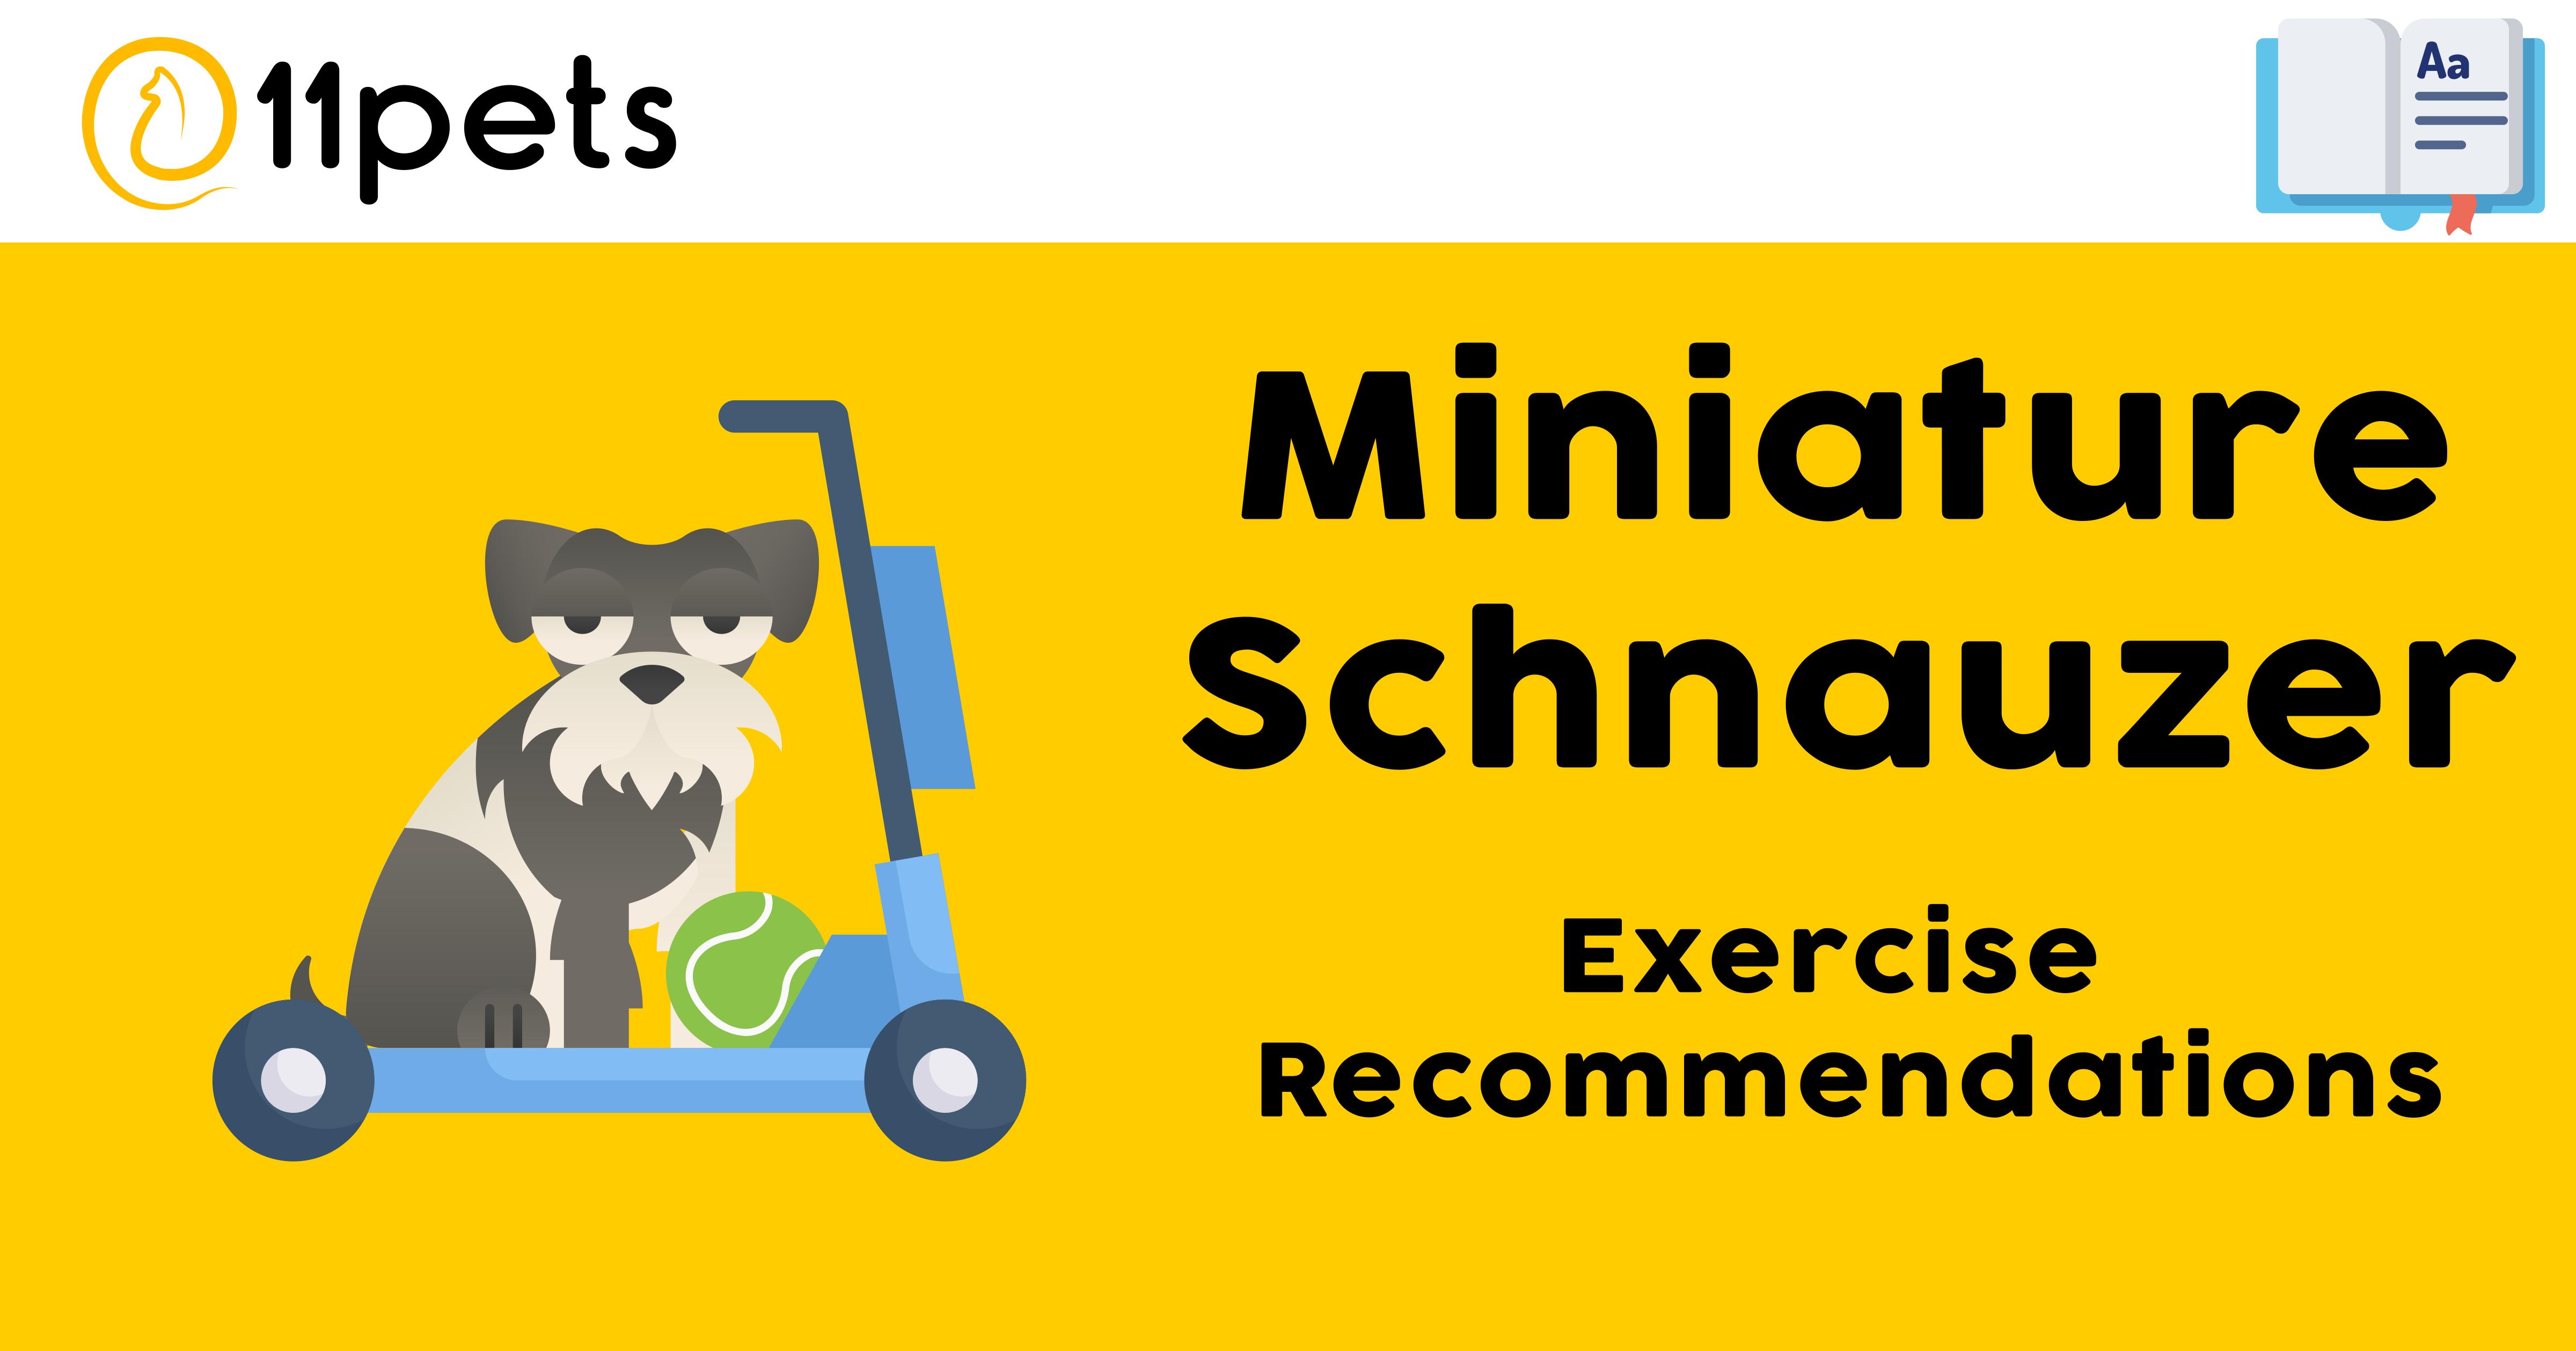 Miniature Schnauzer - Exercise Recommendations